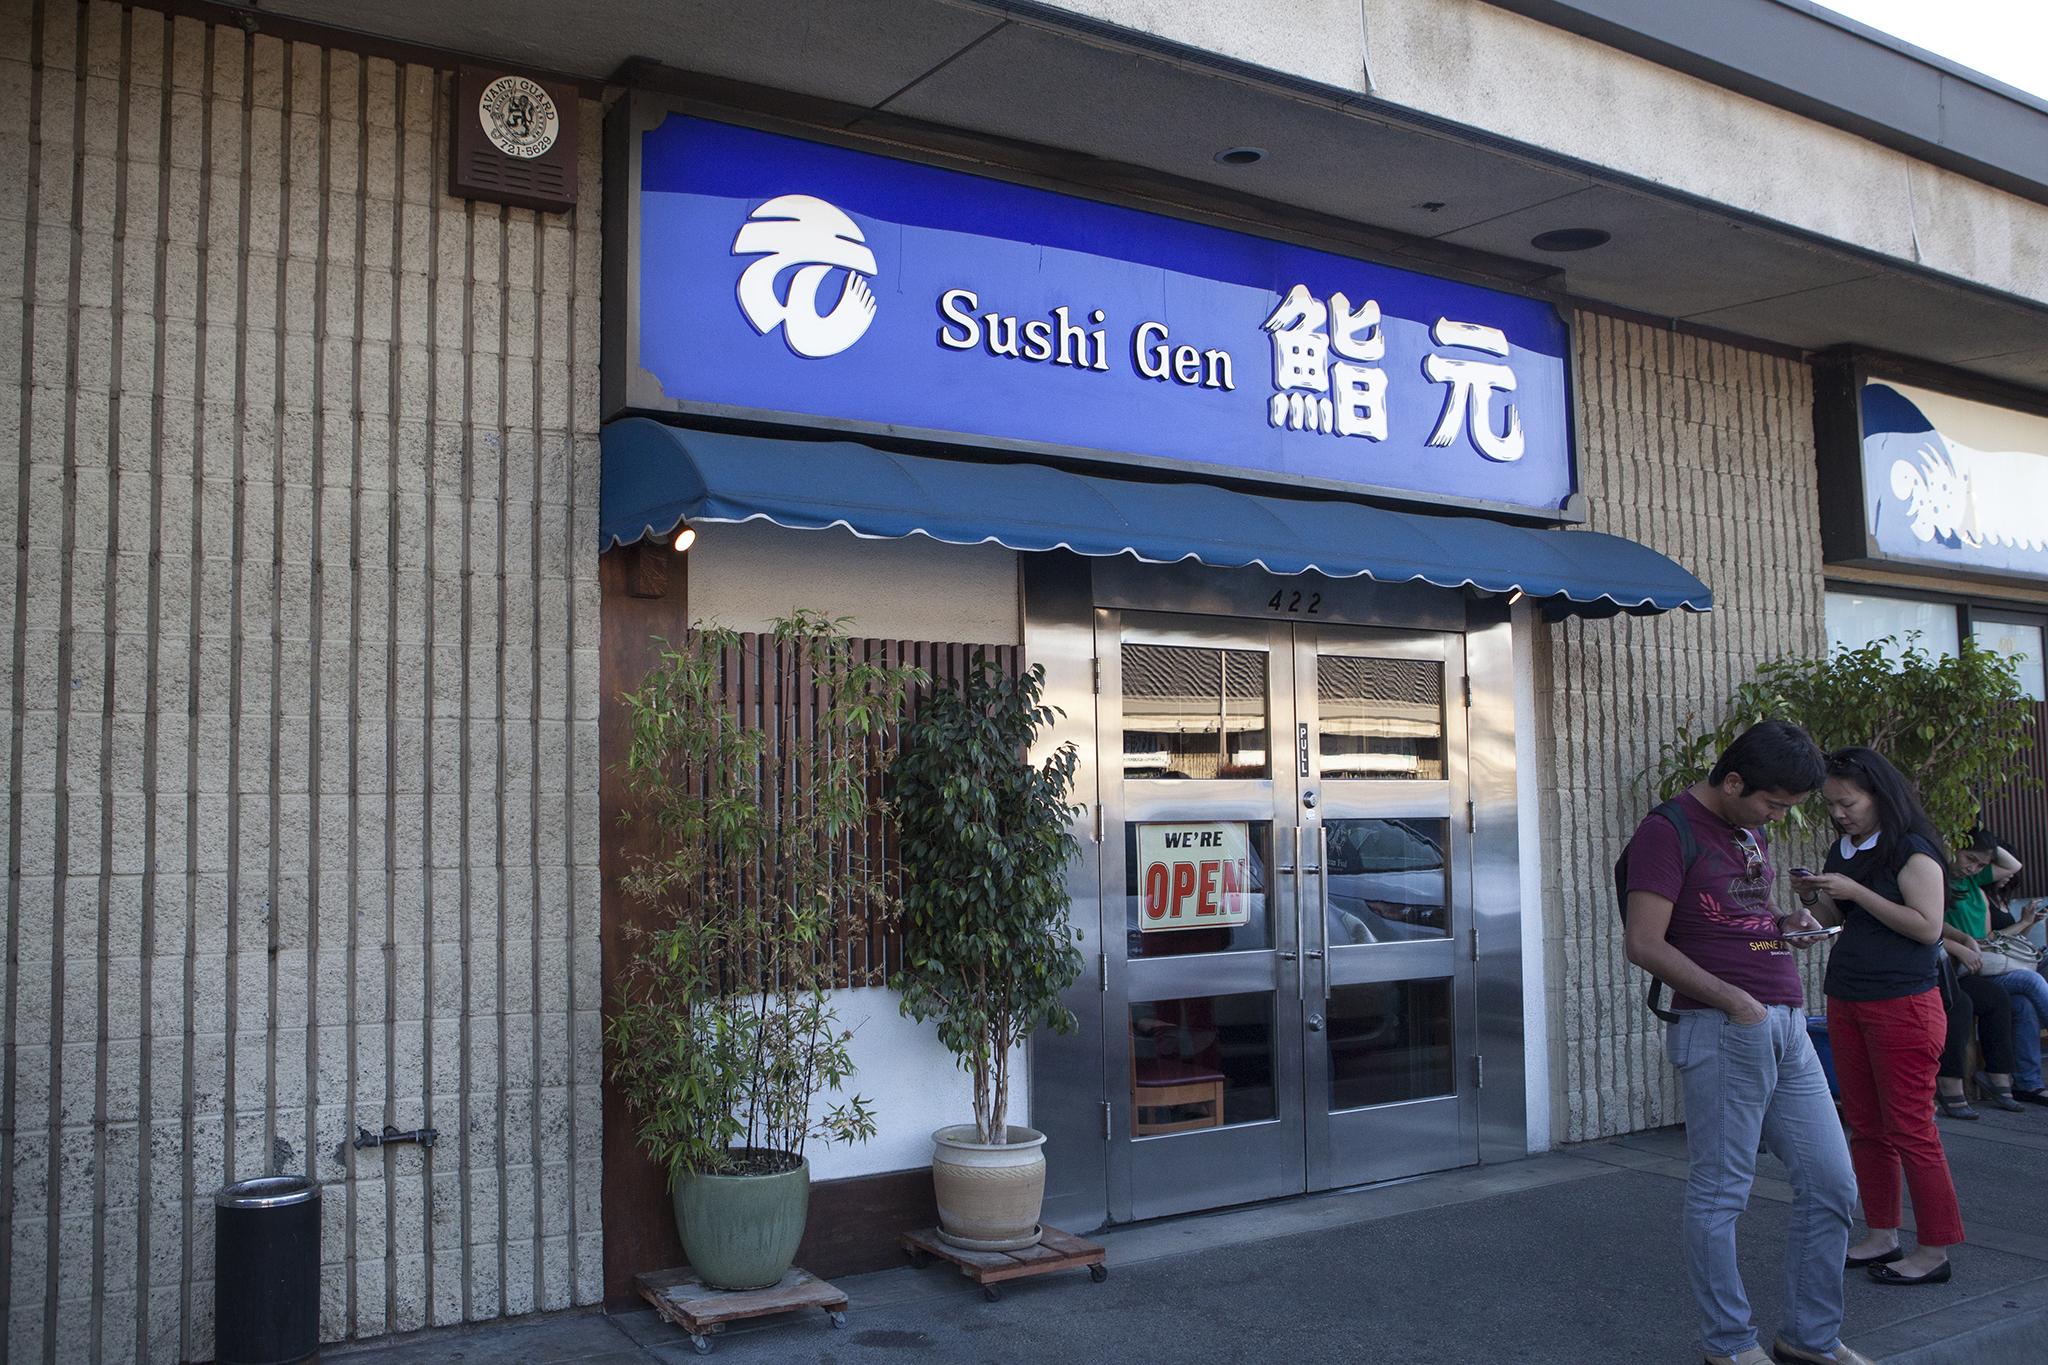 $15 lunch deal: Sushi Gen